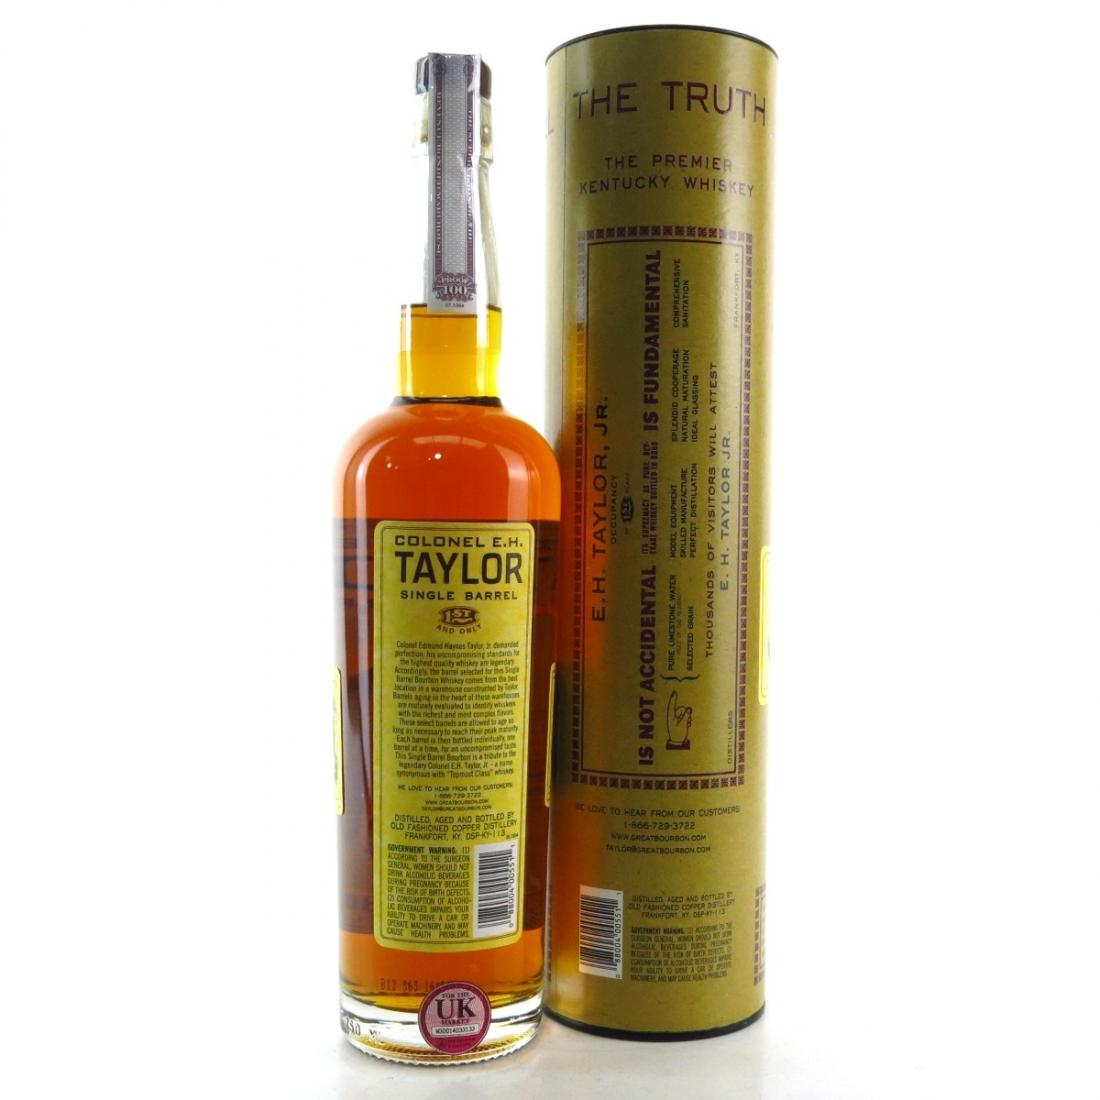 Colonel E.H Taylor Single Barrel Straight Kentucky Bourbon